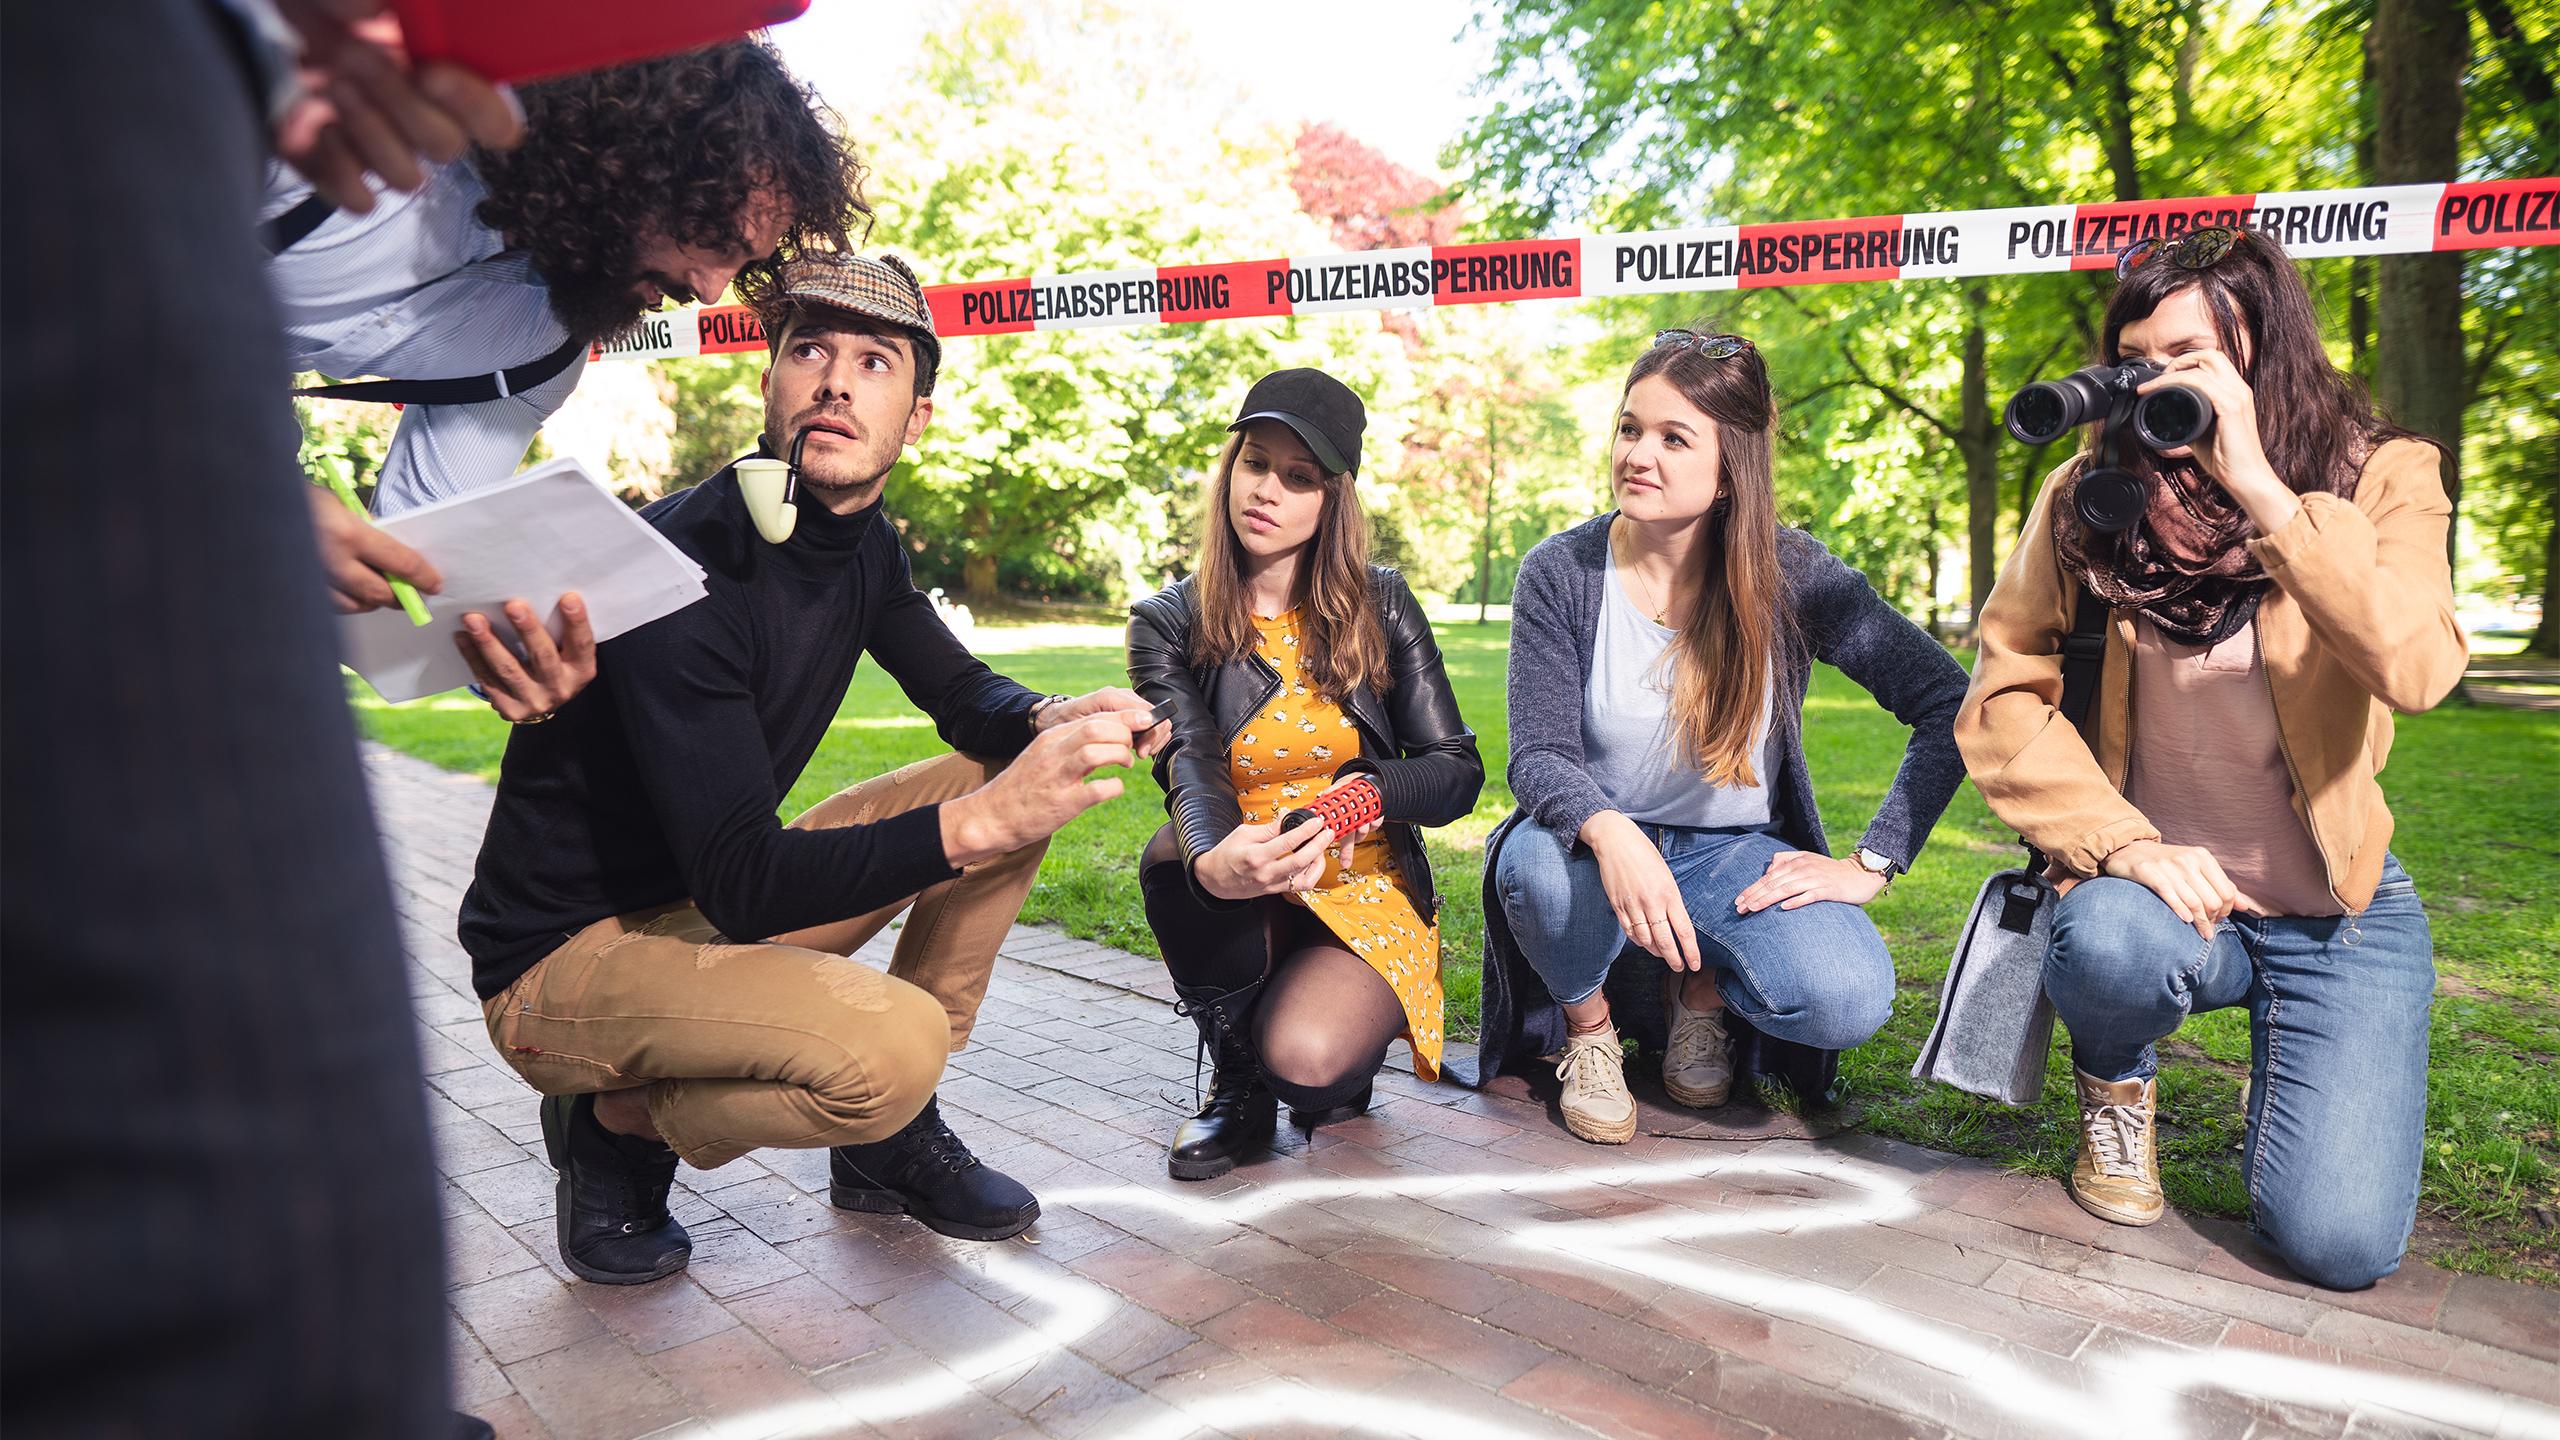 CityGames Krimi Tour: Detektiv auf Spurensuche